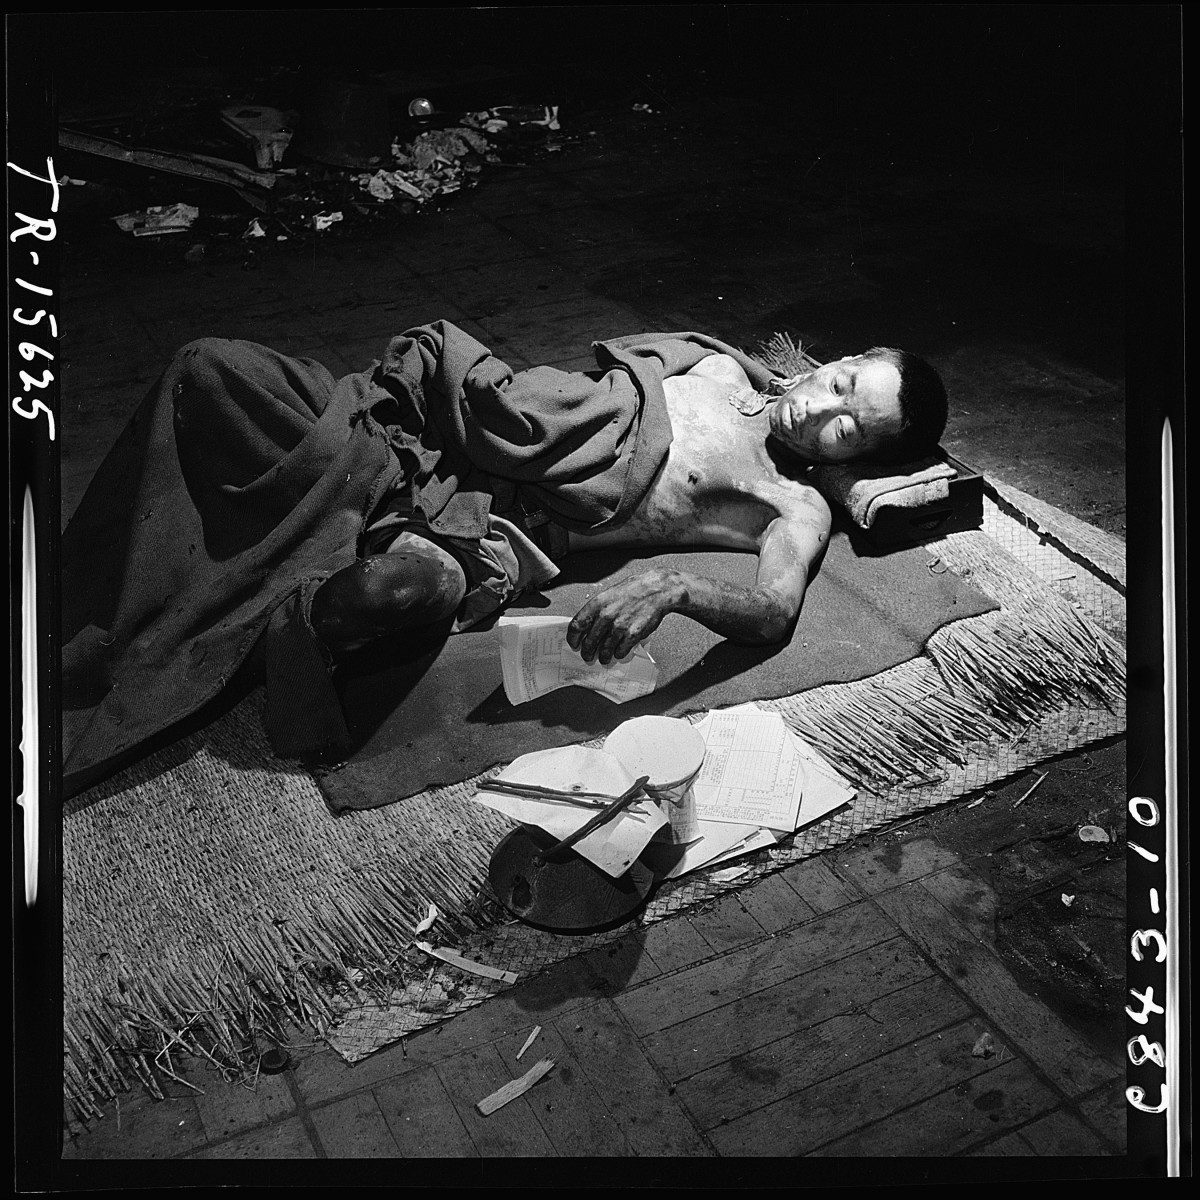 Injuries from Hiroshima bomb